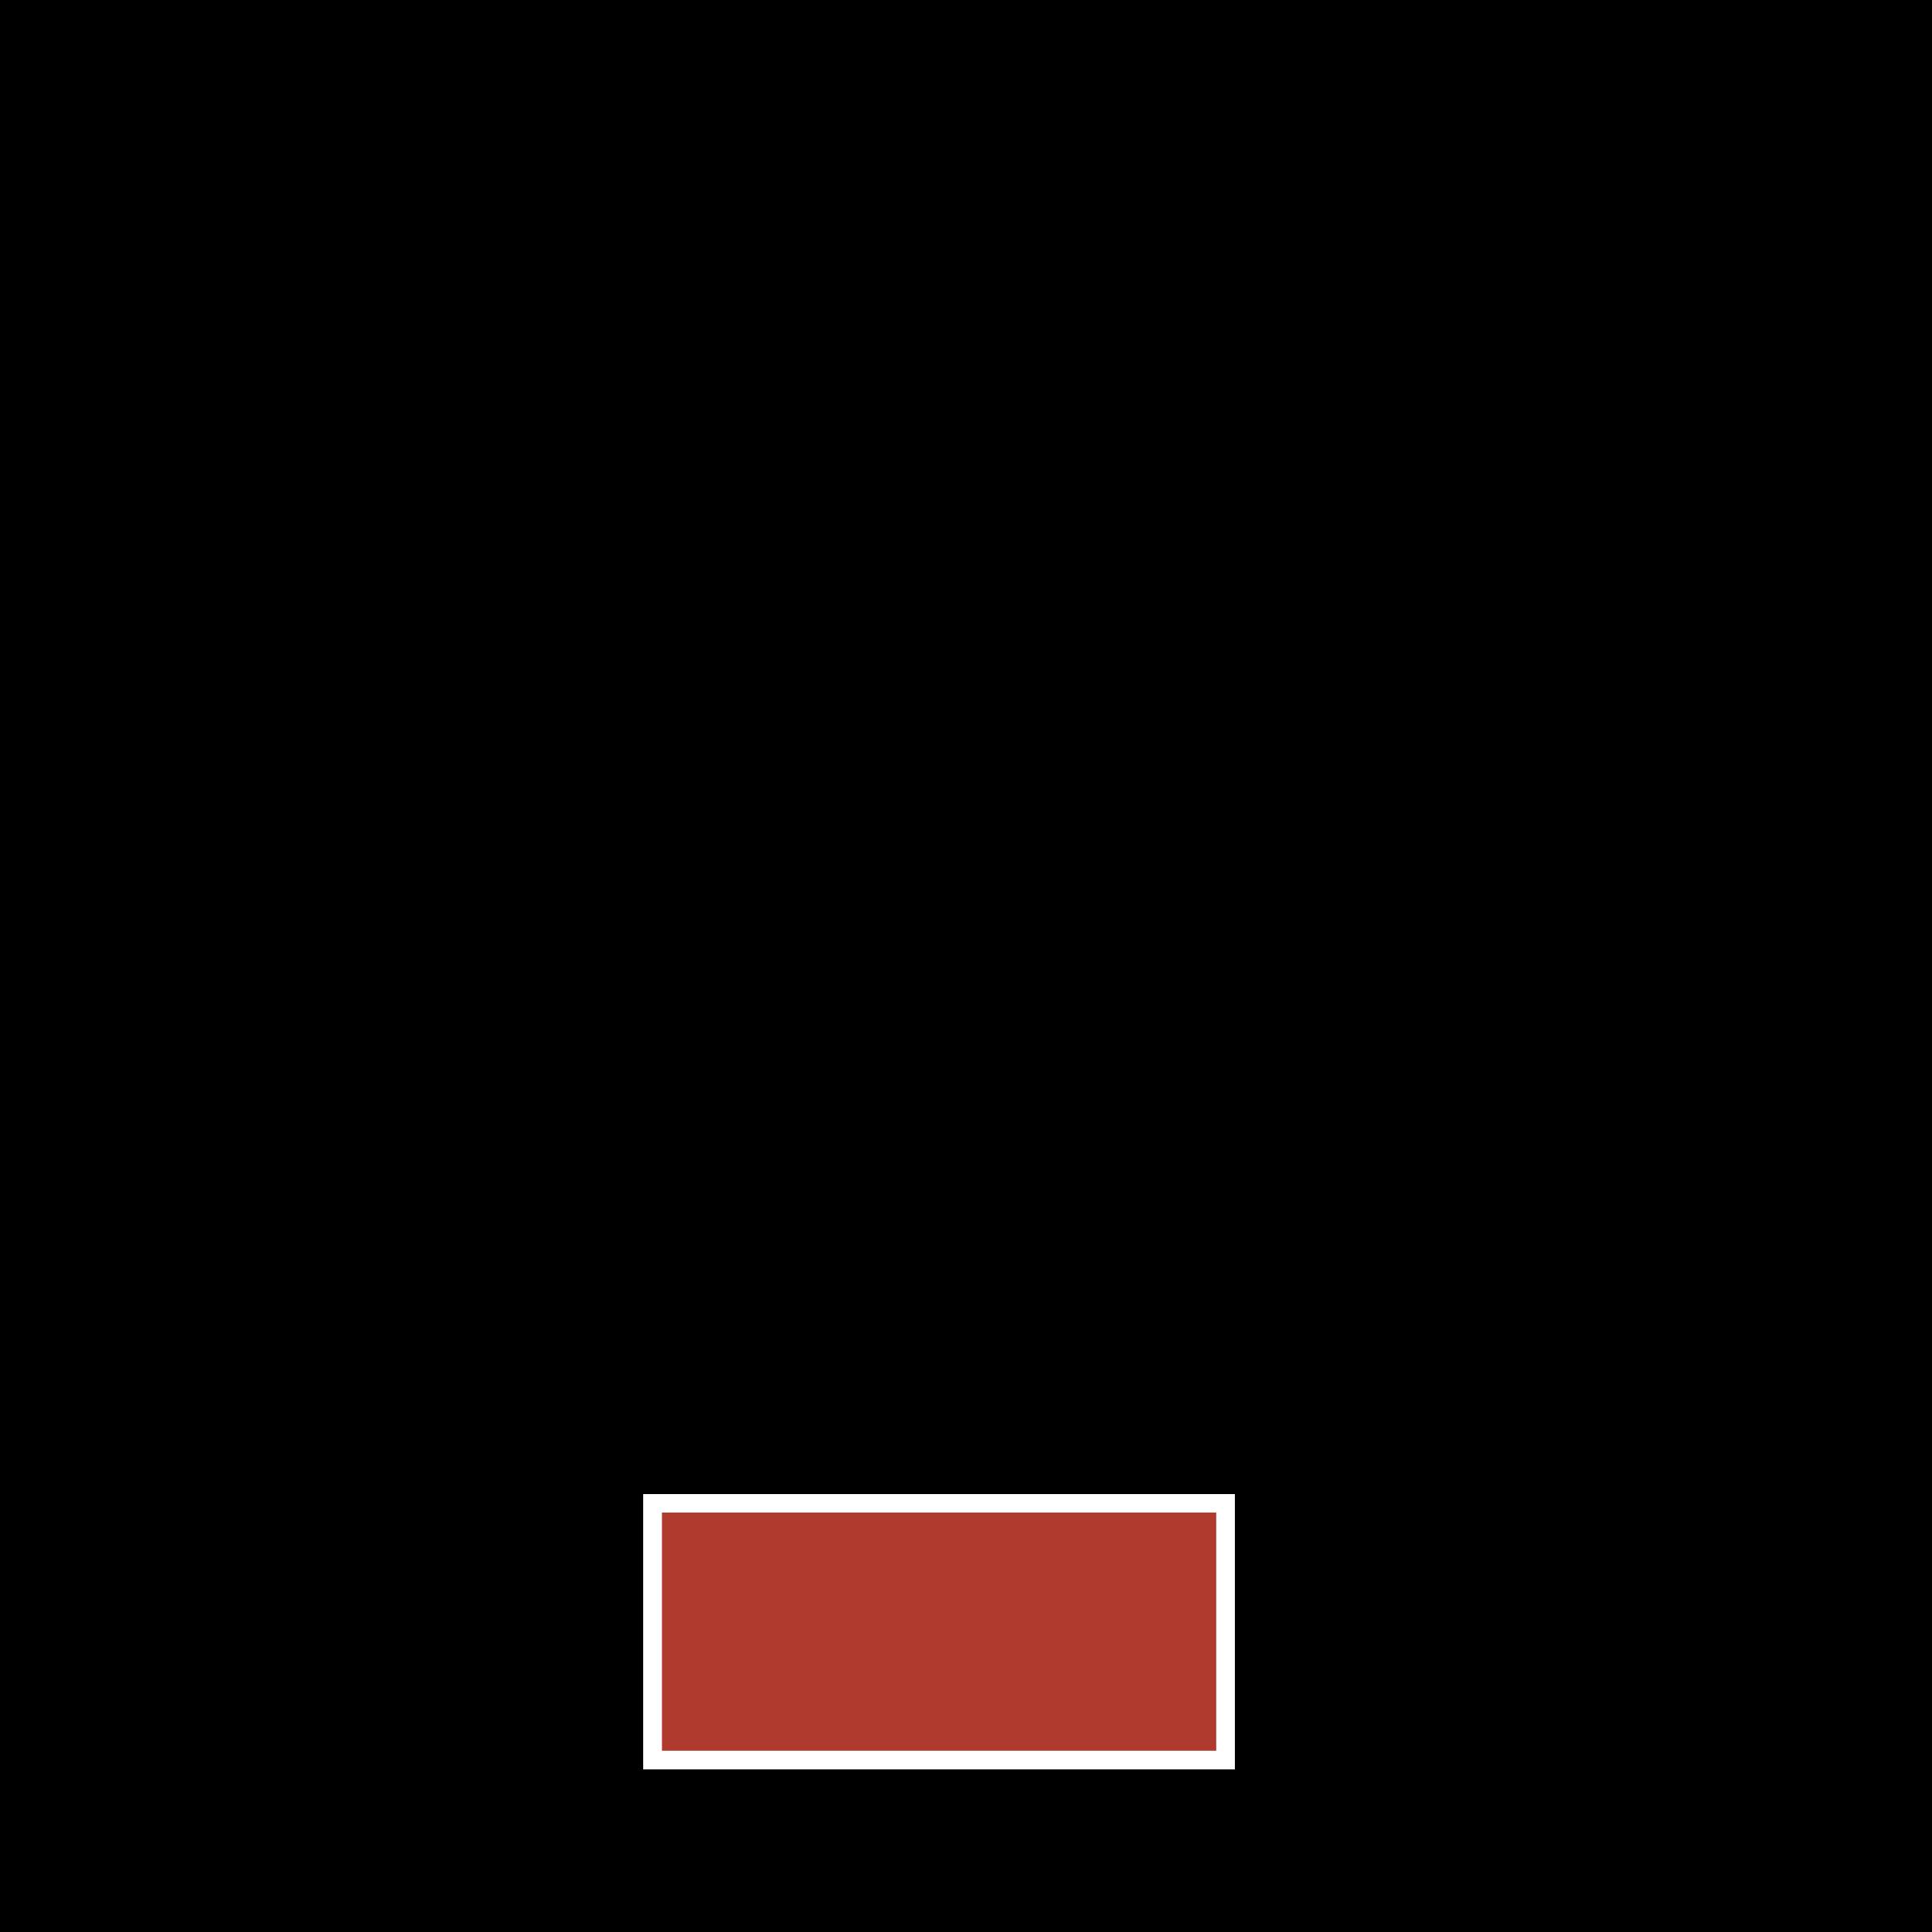 Cincinnati Bearcats Logo PNG Transparent & SVG Vector.